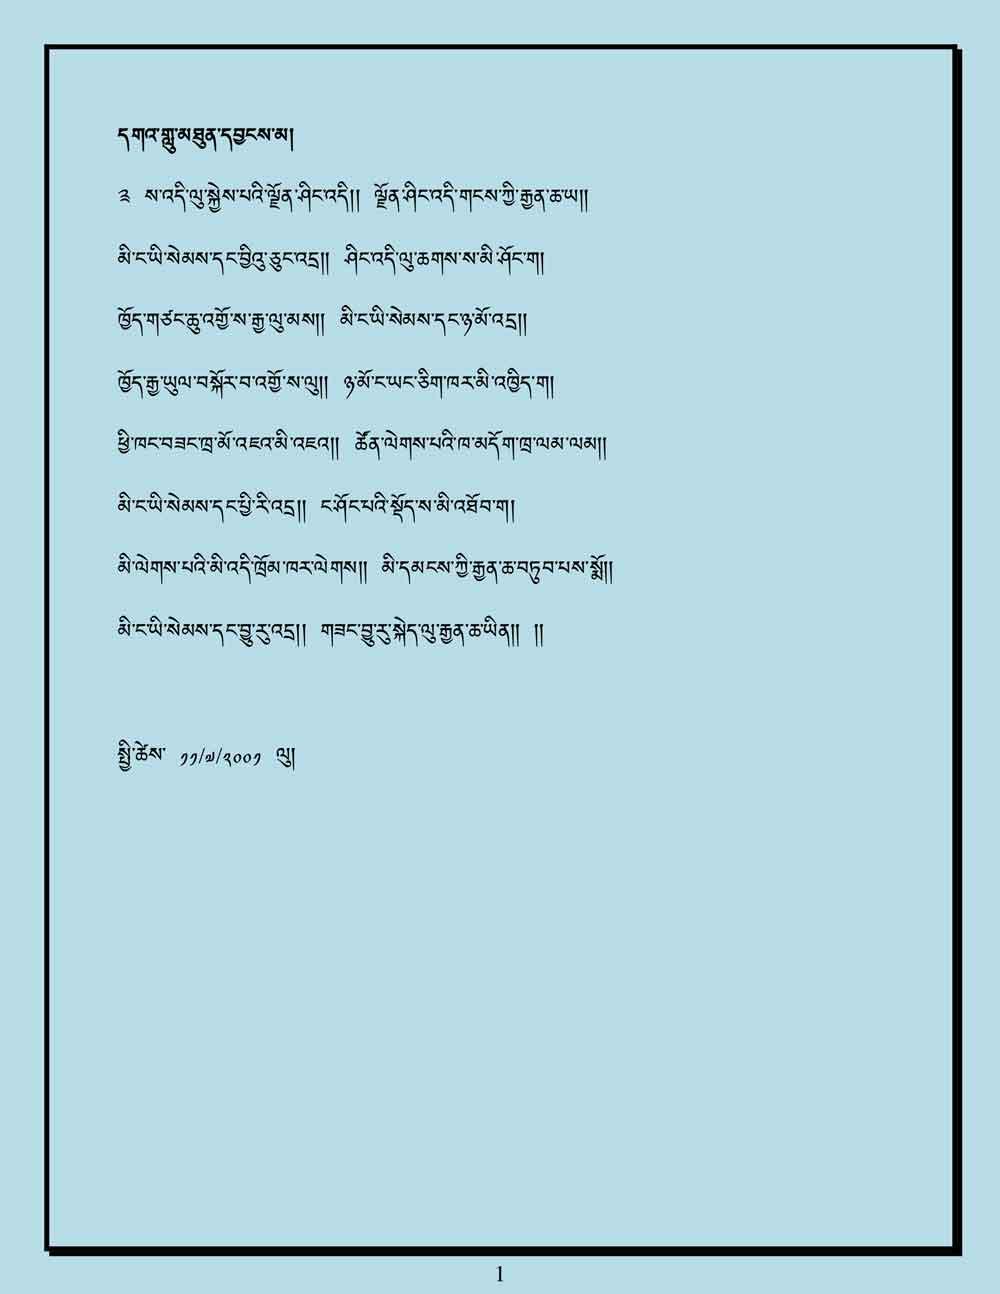 Ap-Gangkar-Lyrics-1.jpg